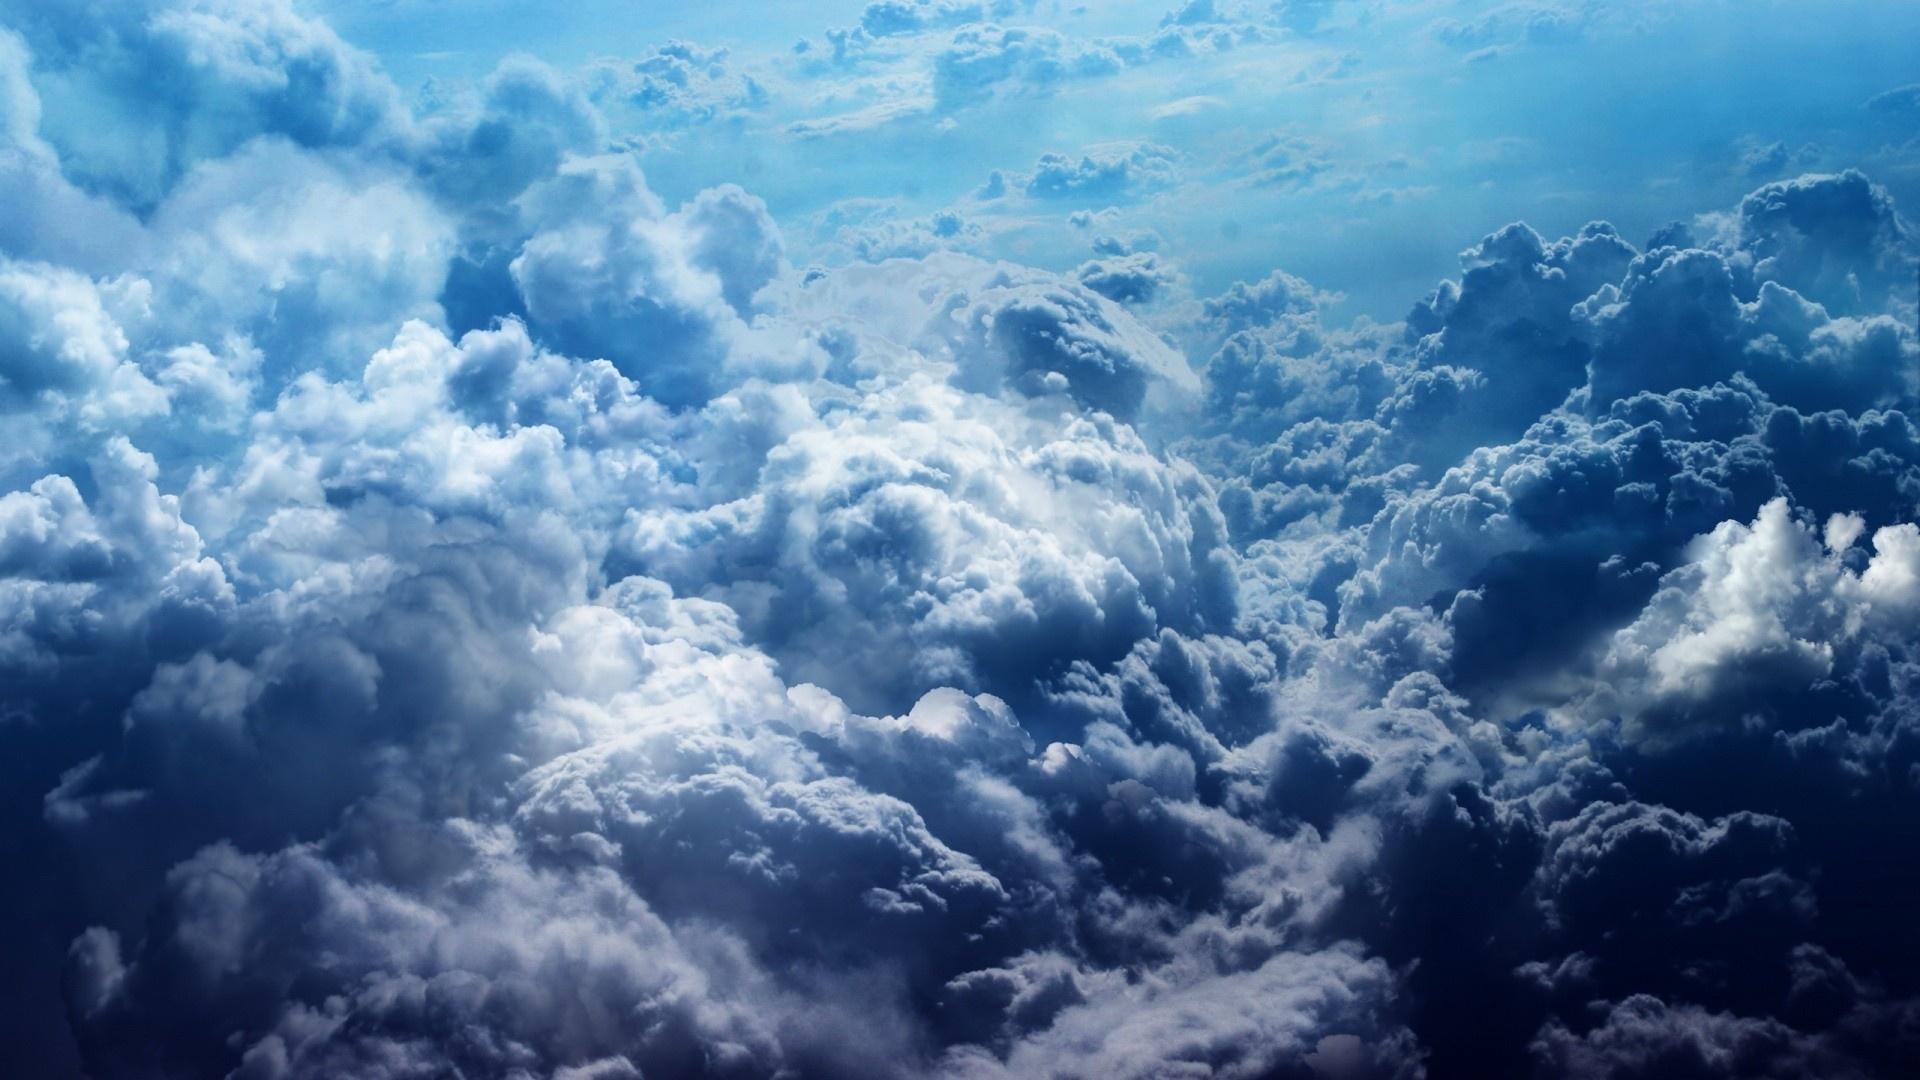 Storm Clouds #6858822